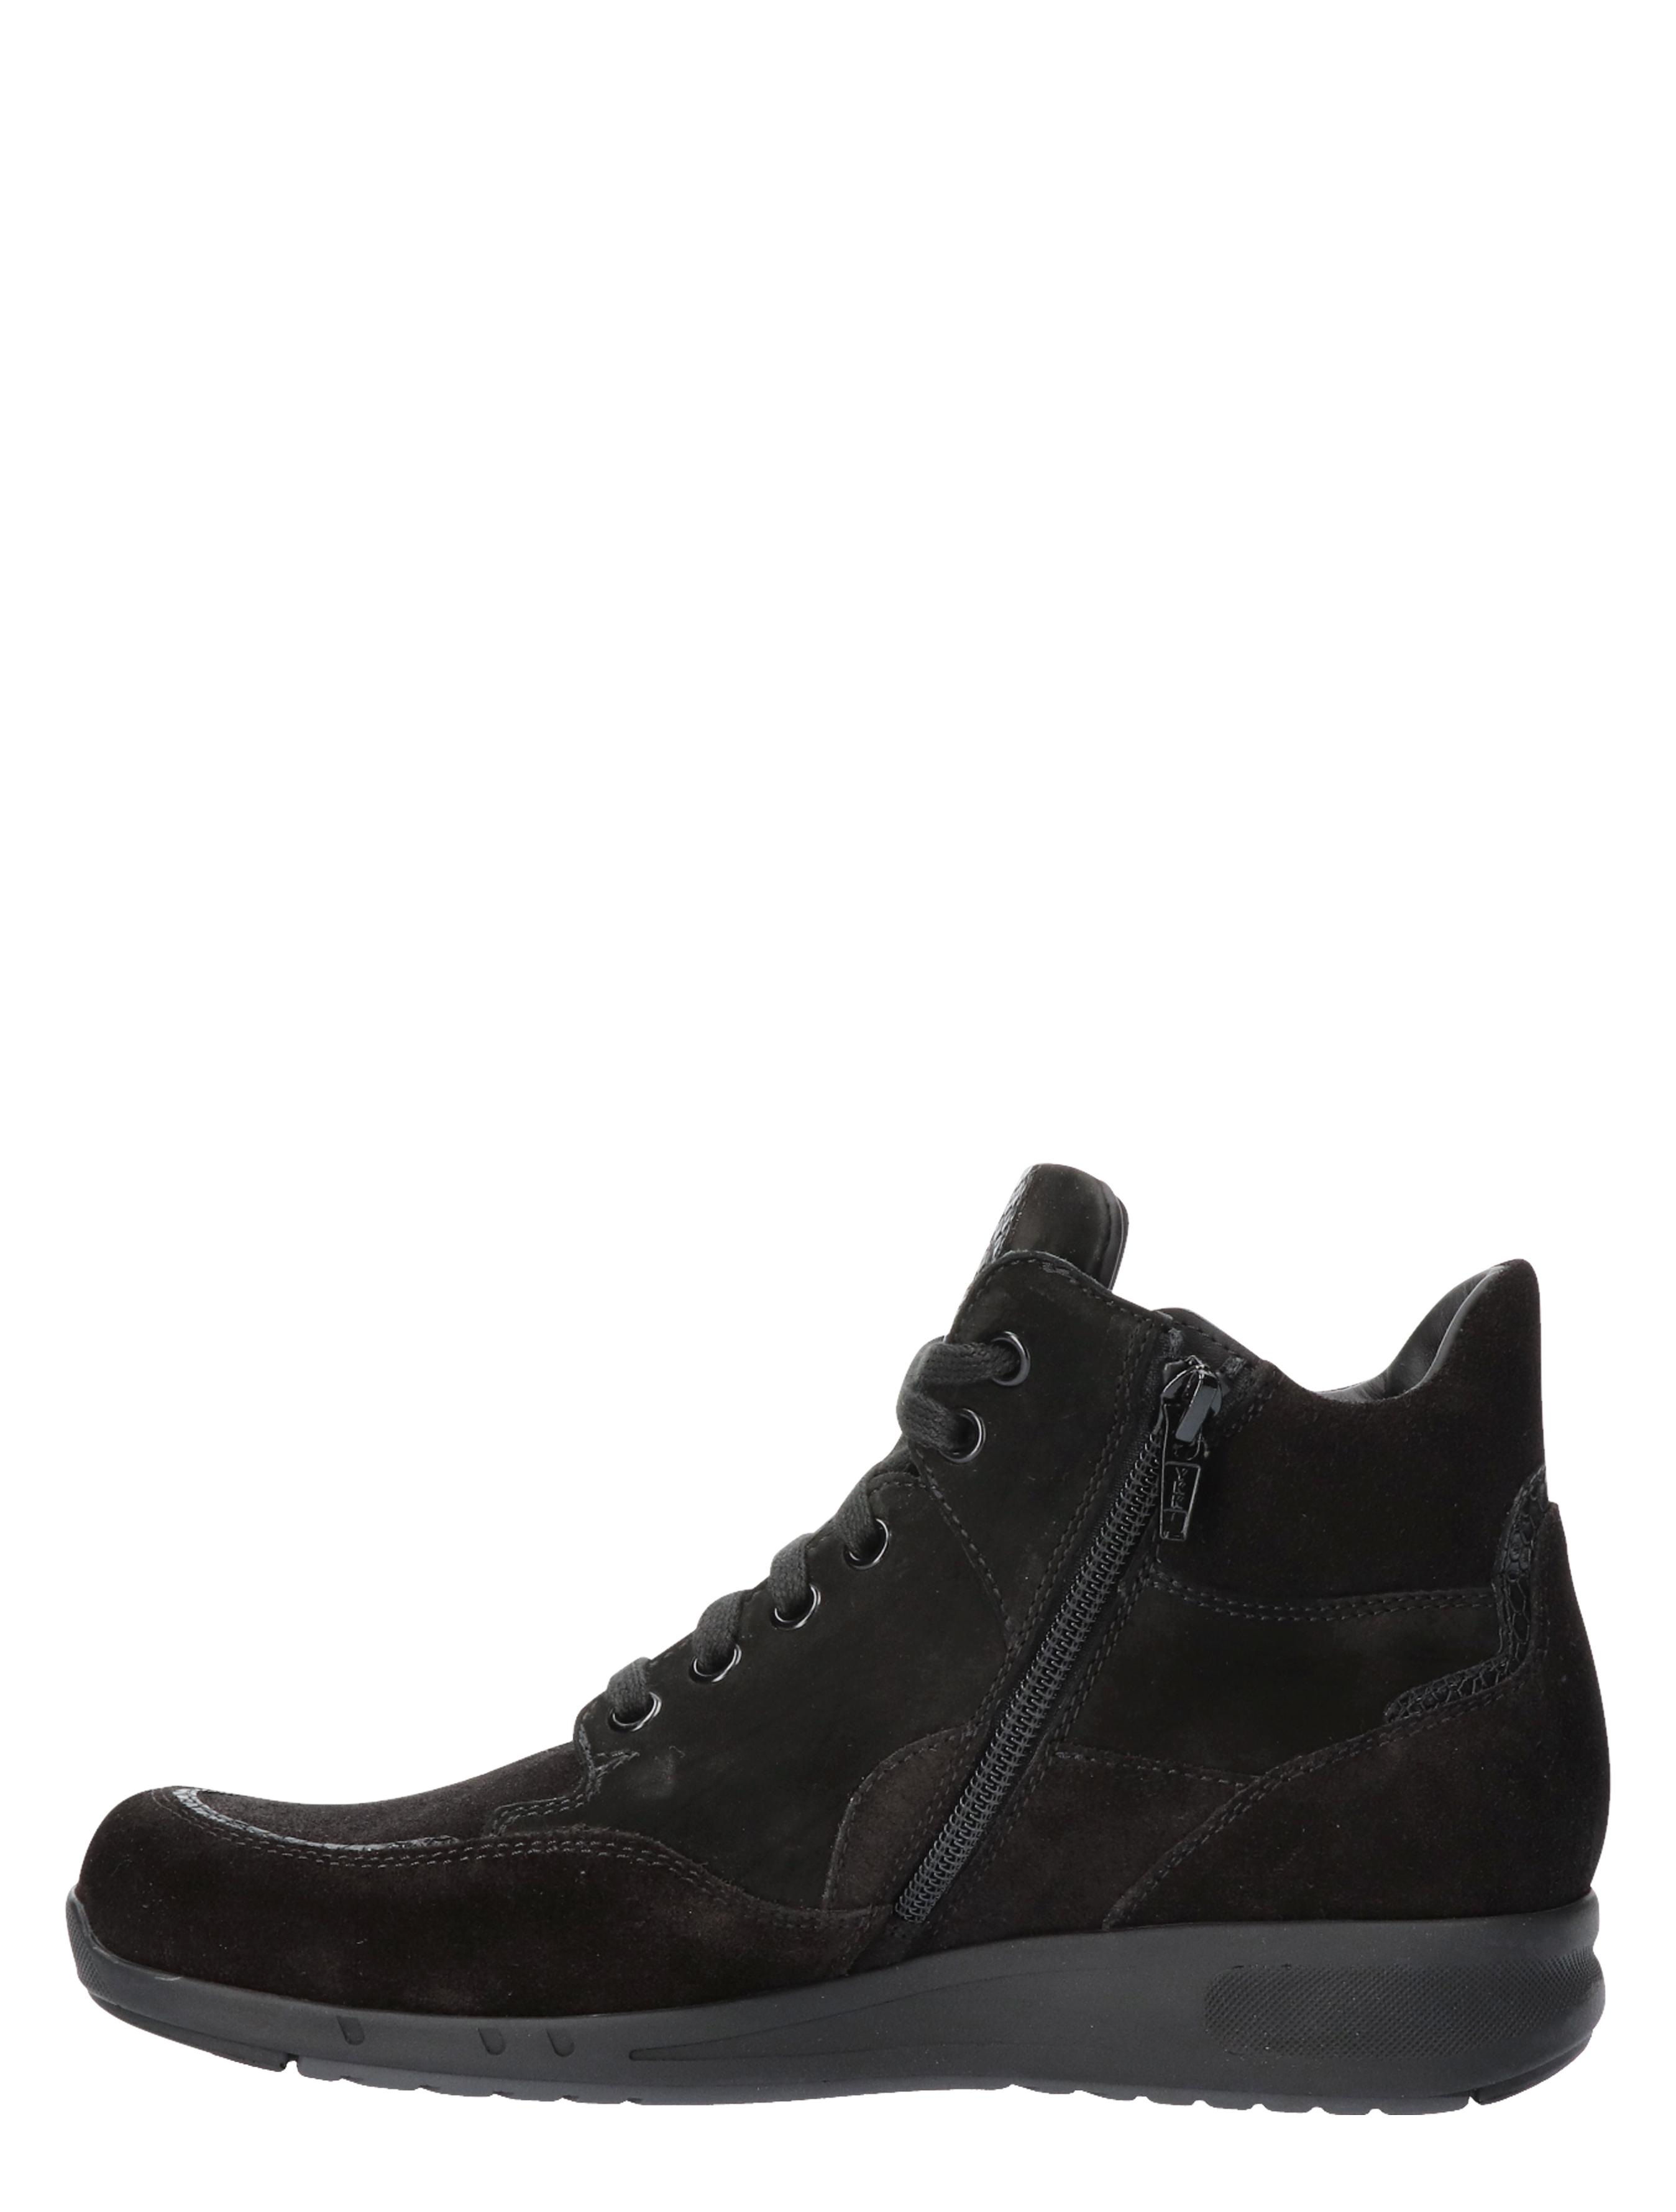 Durea 9735 682E Zwart E-Wijdte Veter boots